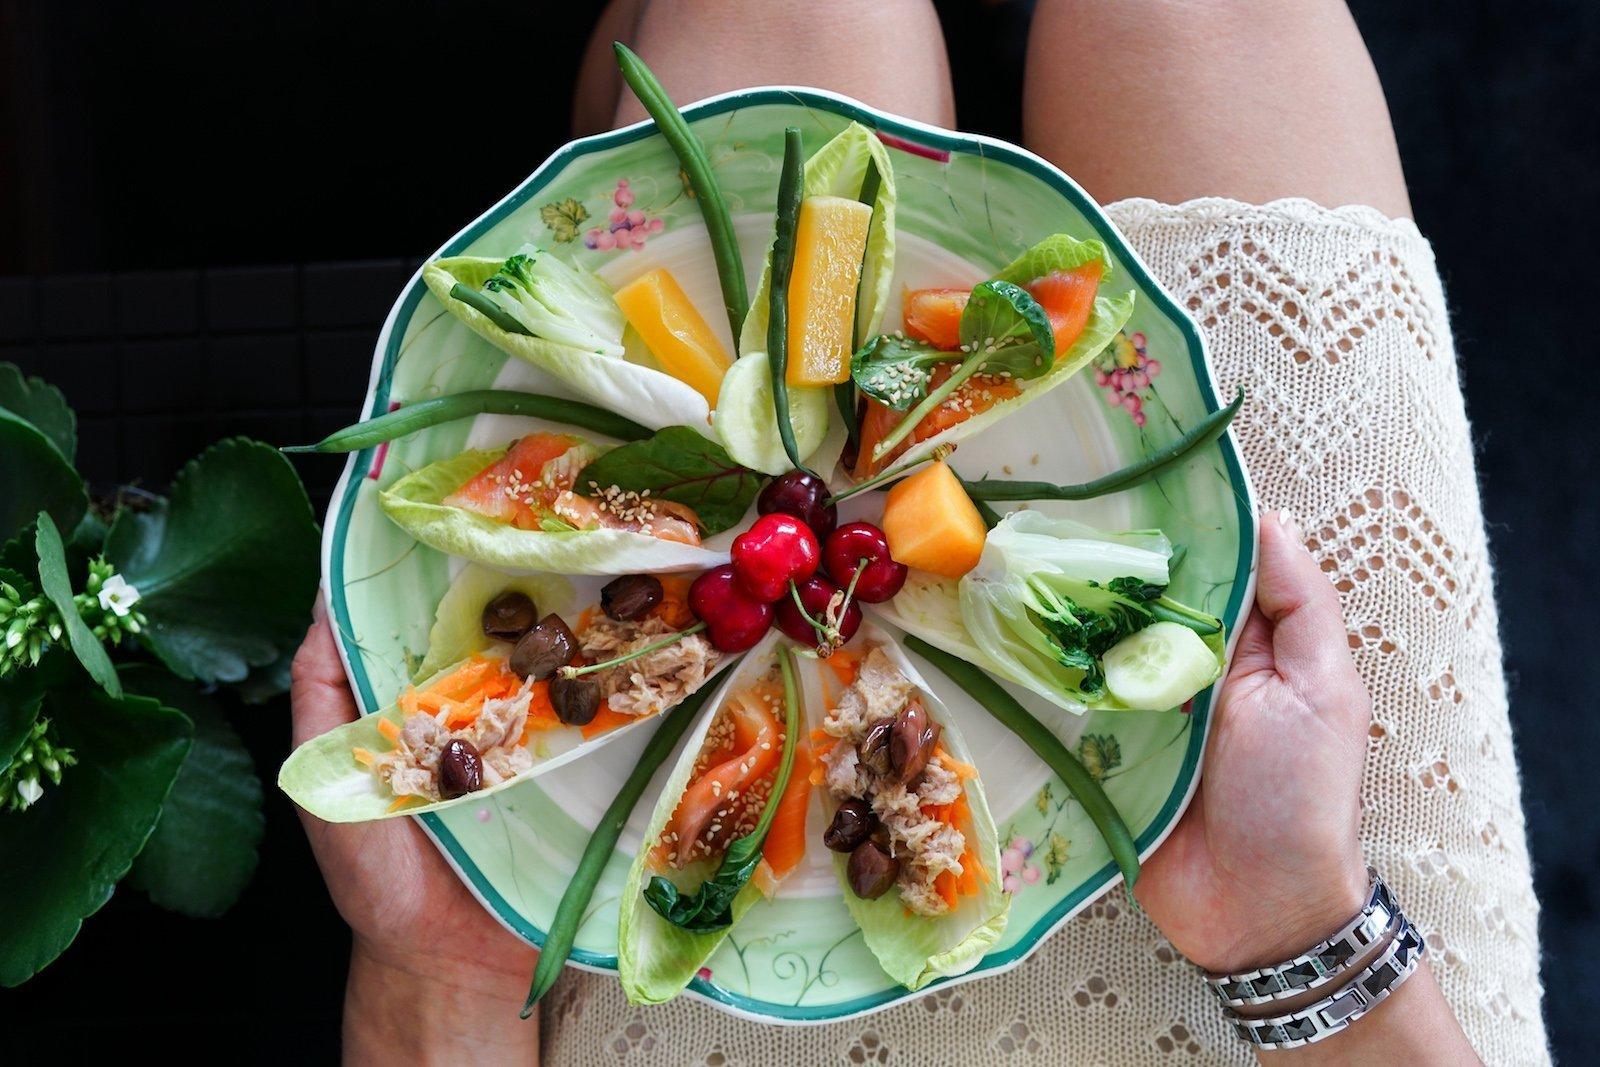 10 Strategies to Avoid Gluten in Restaurants 0